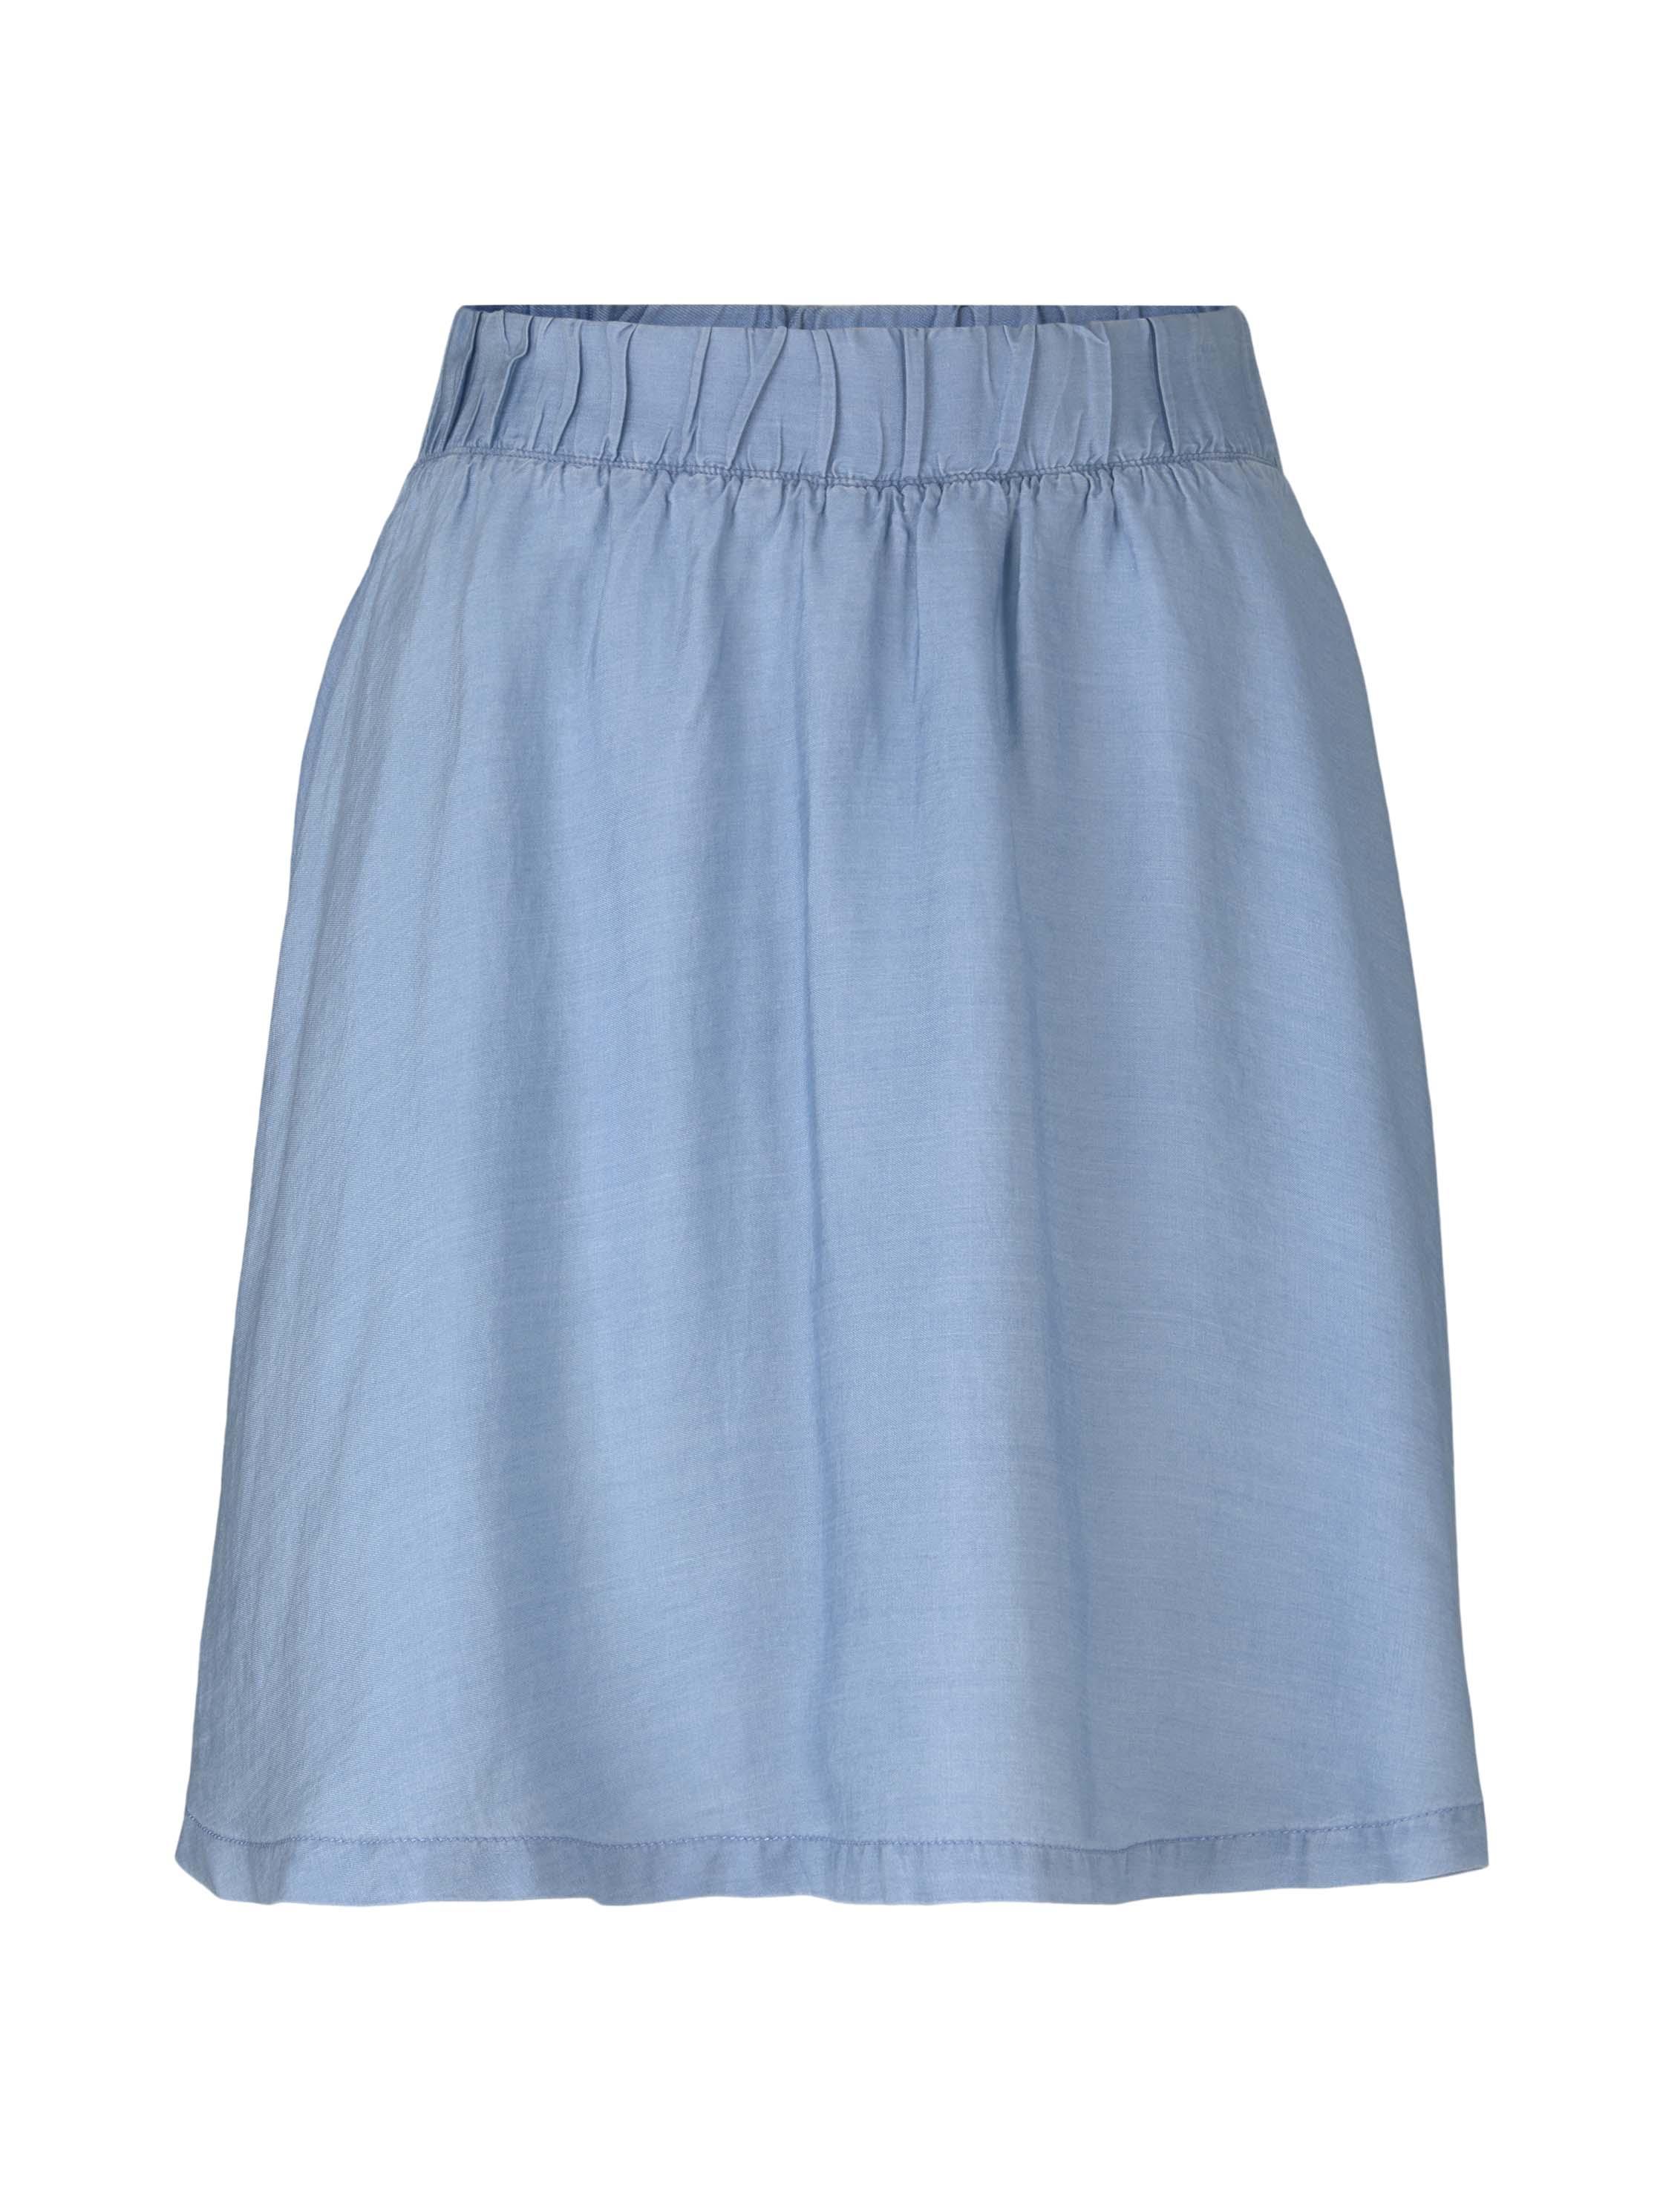 flared chambray skirt, light stone bright blue denim